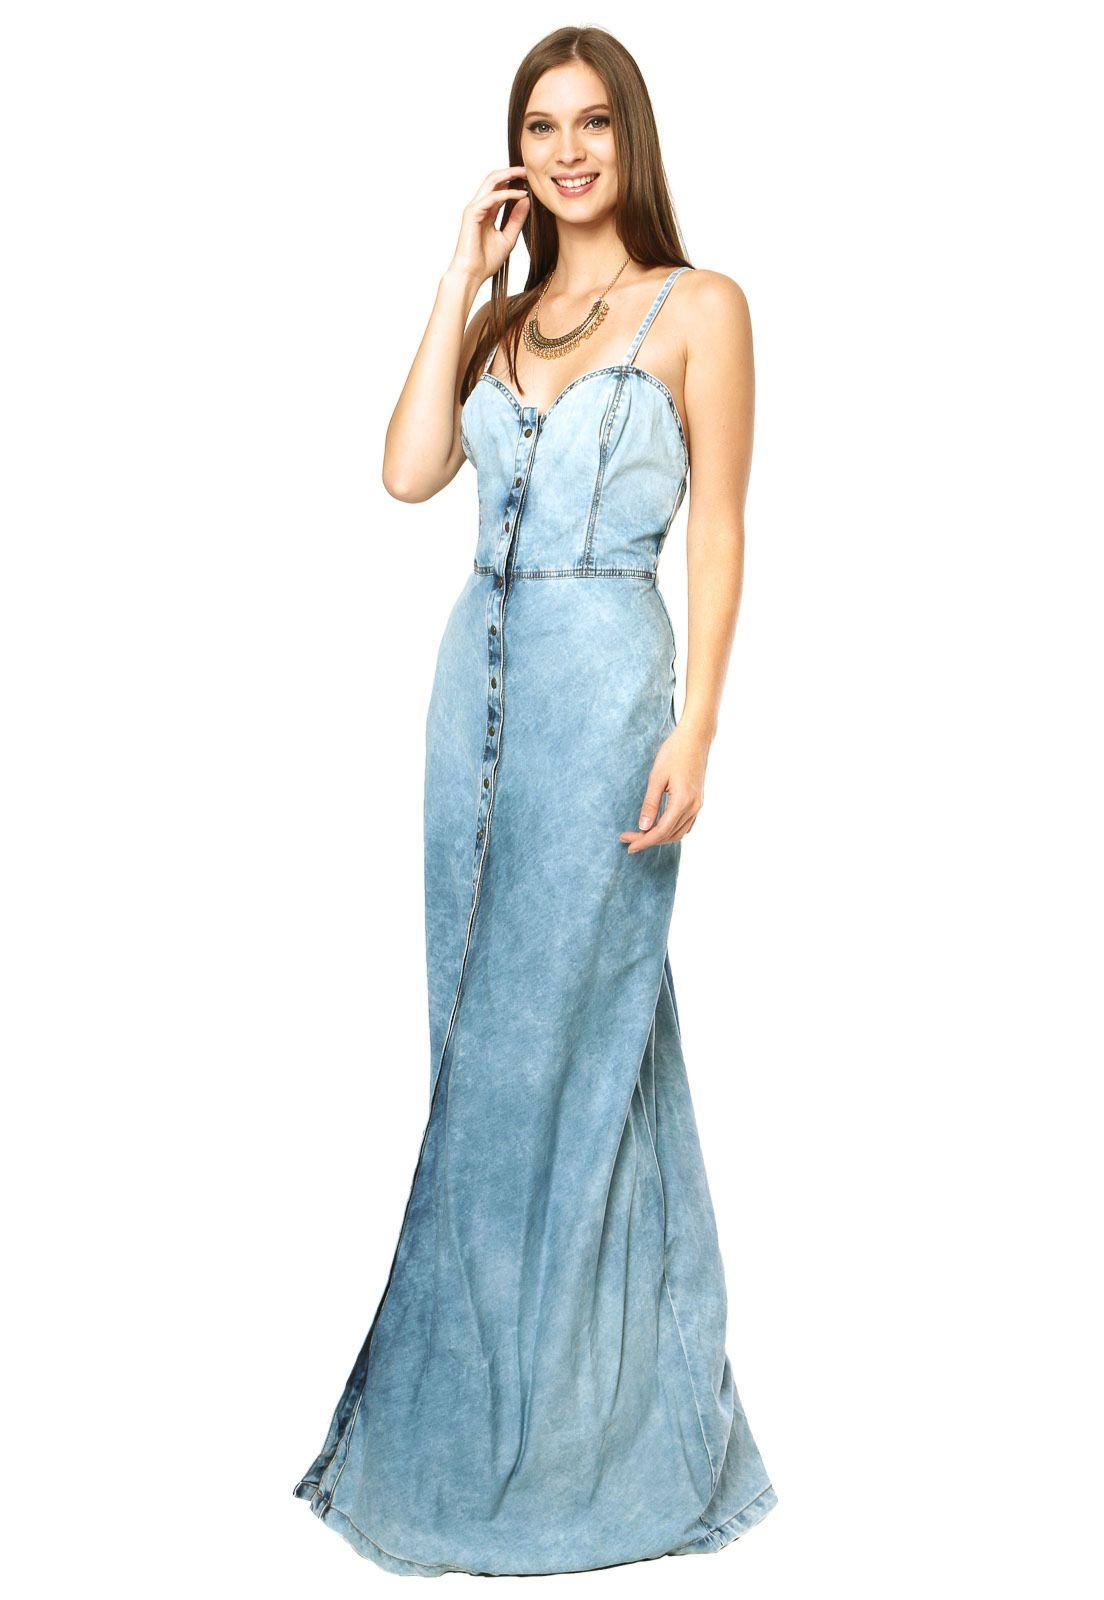 1944edf2ad23 Vestido Jeans Lança Perfume Azul | ropas | Vestido jeans, Jeans e ...